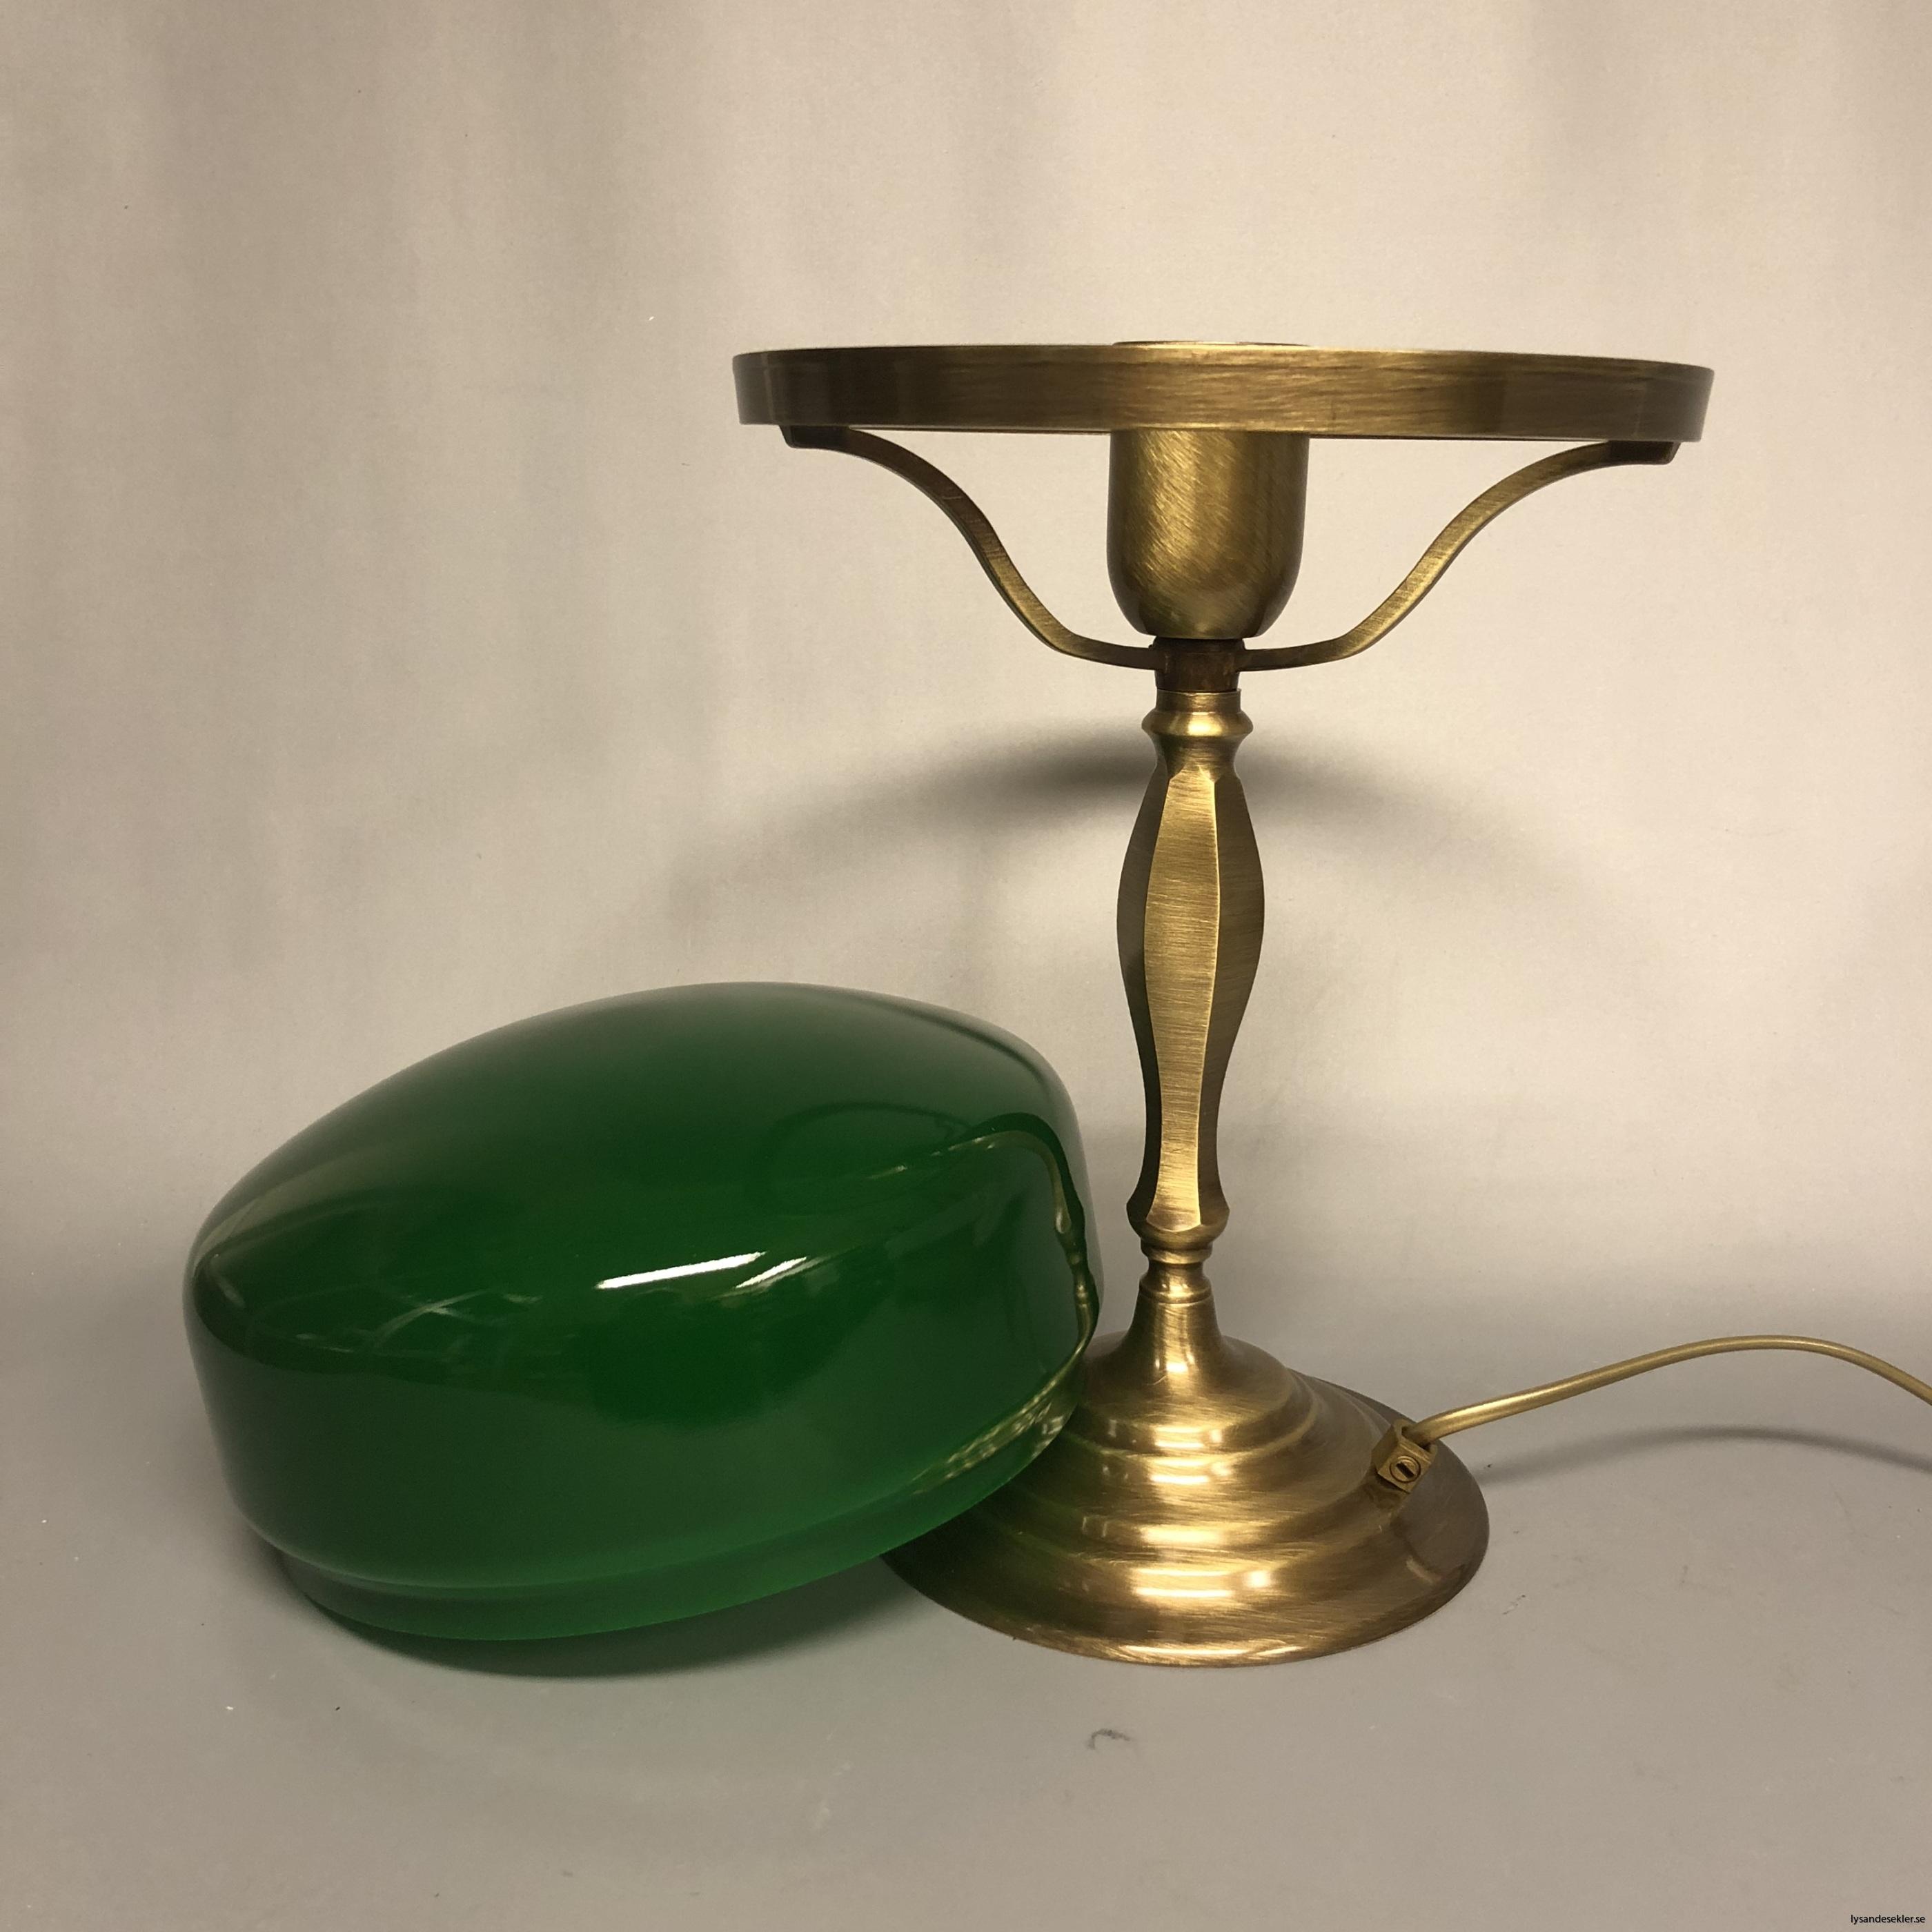 strindbergslampa strindbergslampor strindberg lampa skärm kupa strindbergsskärm strindbergskupa17